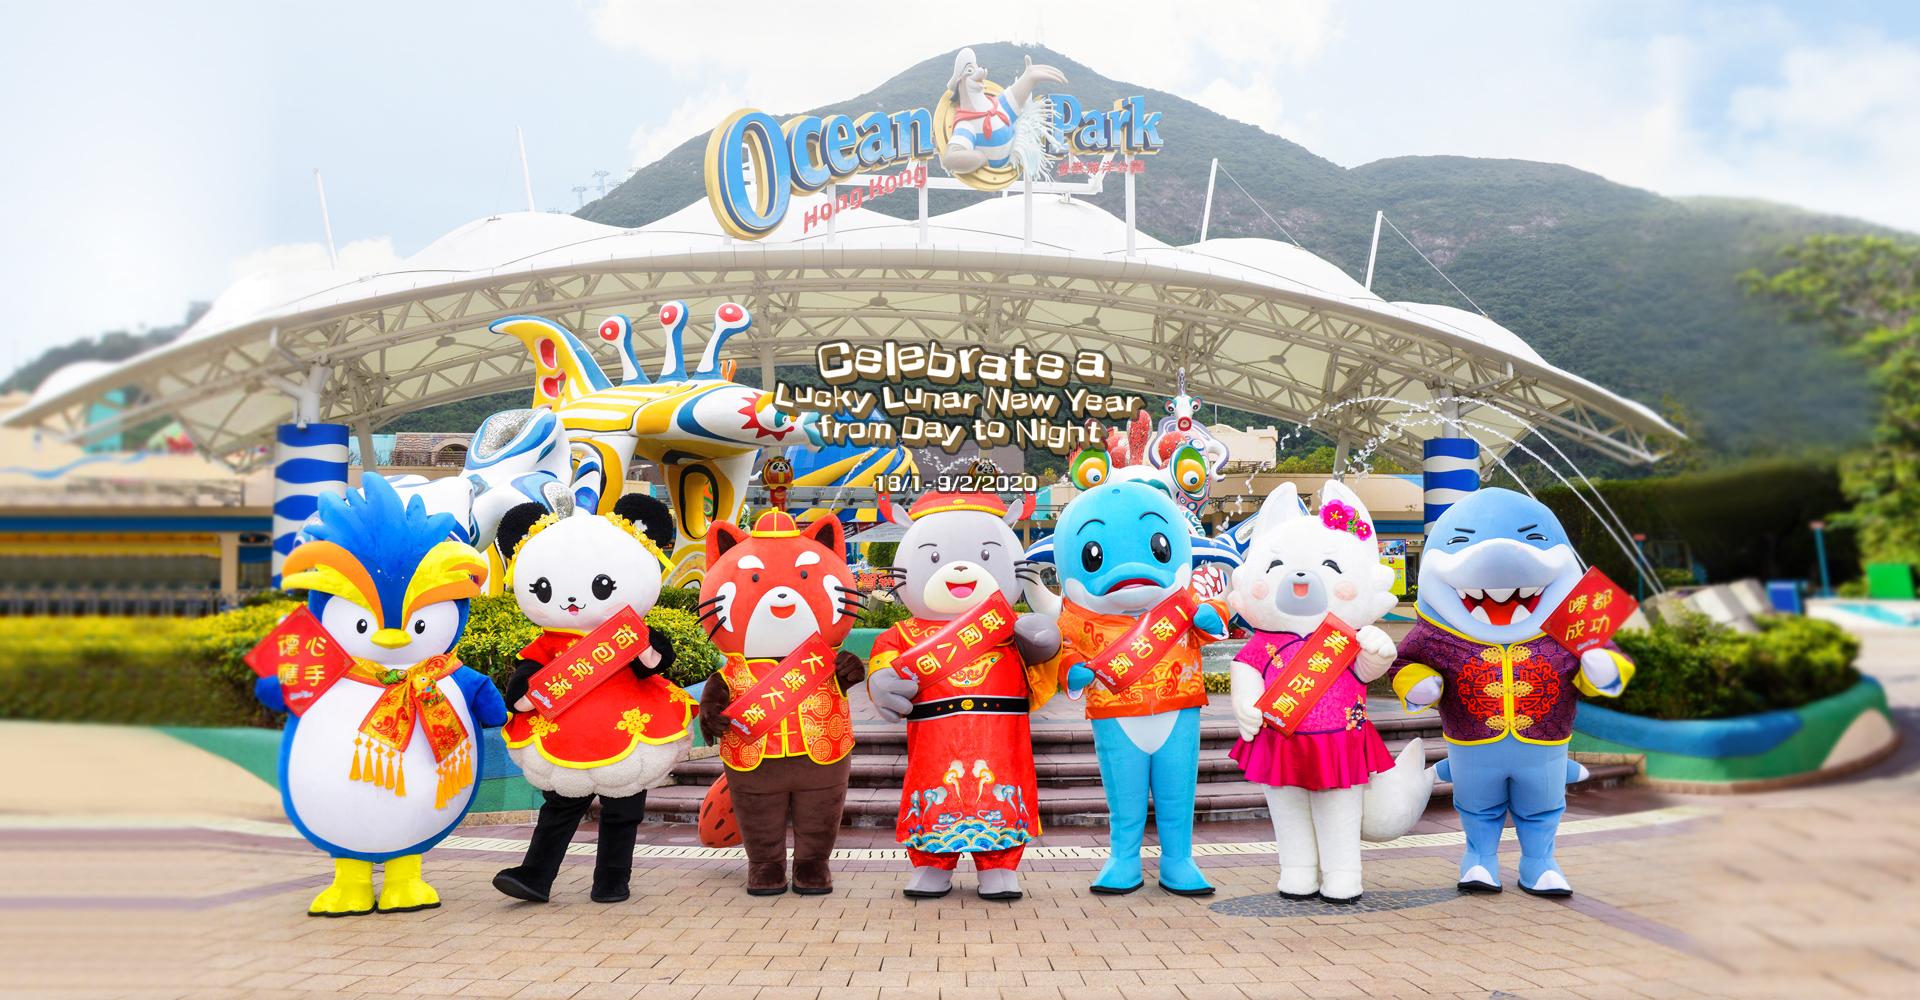 https://media.oceanpark.com.hk/files/s3fs-public/cny_inside_en.jpg